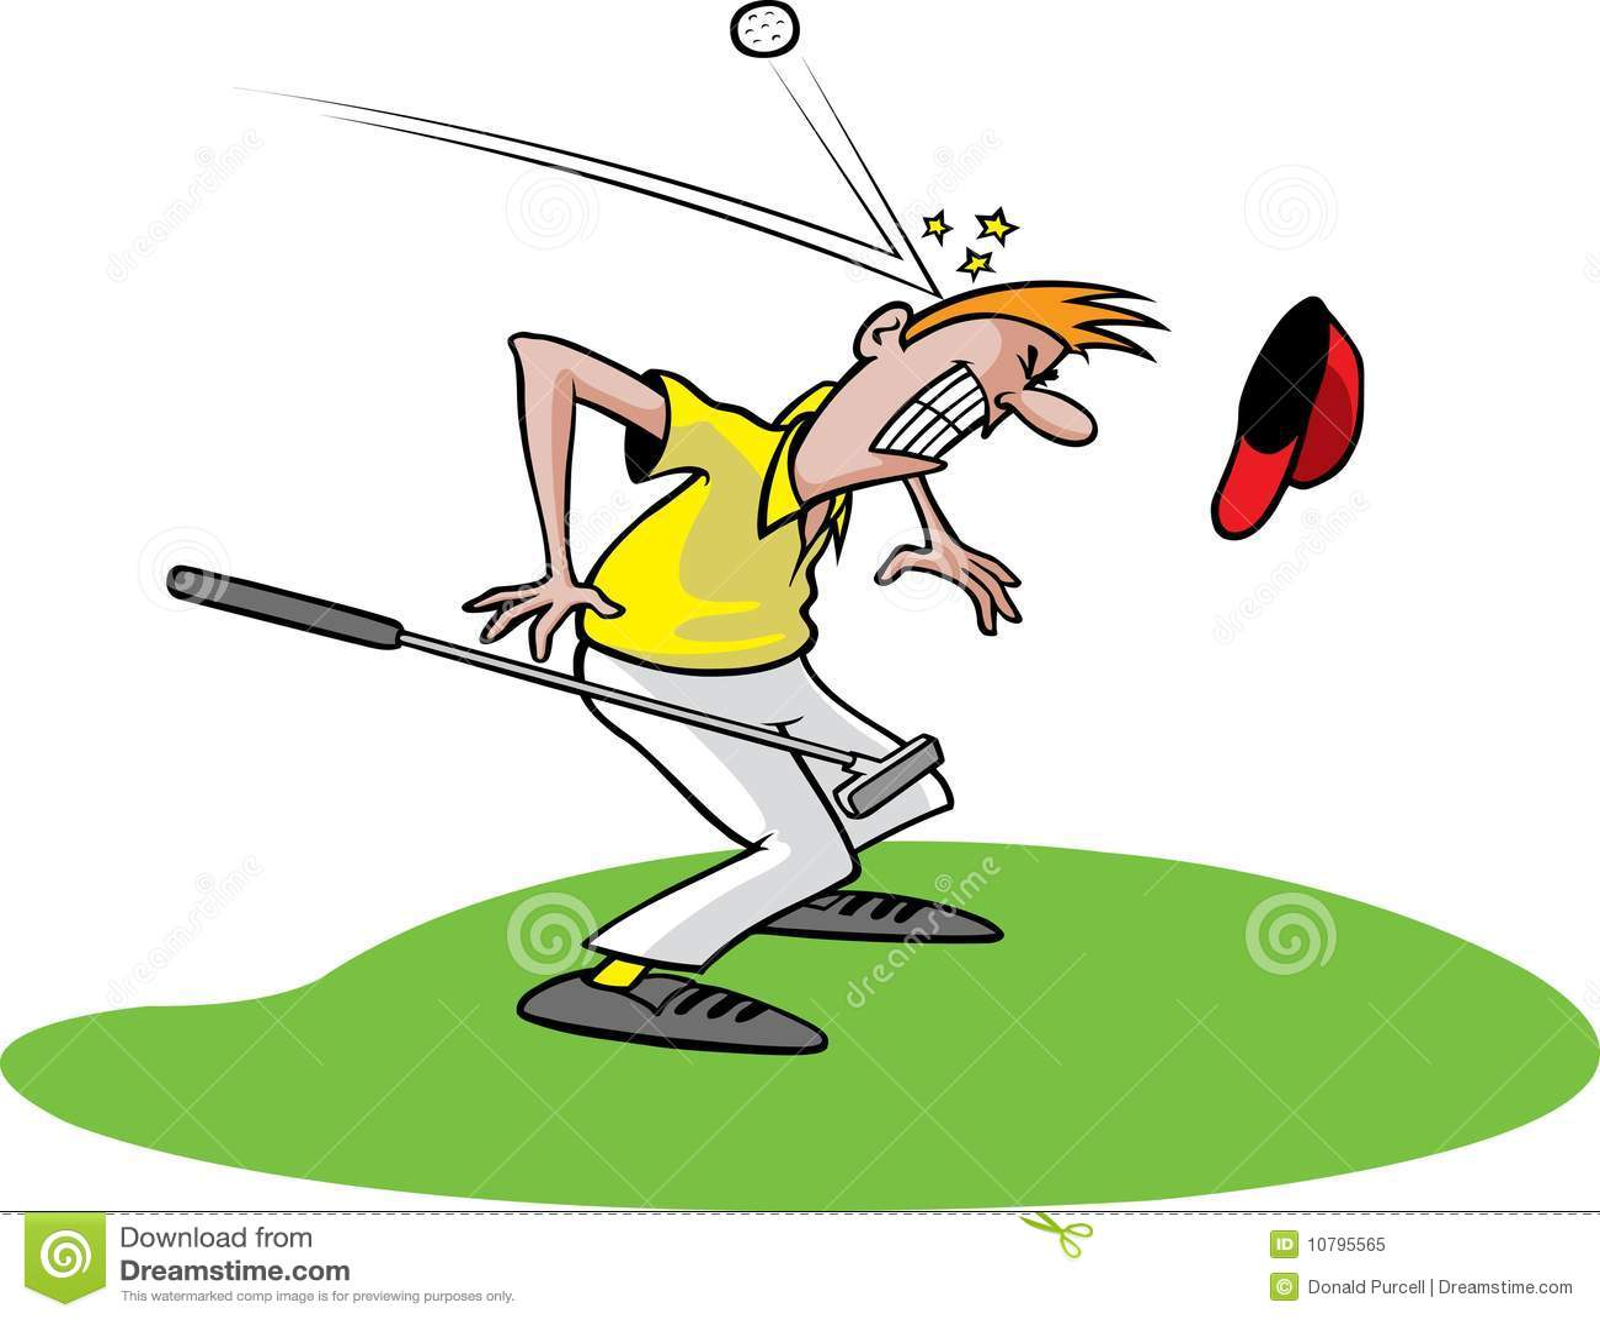 Goofy Golf Guy 1 Stock Vector. Illustration Of Cartoon